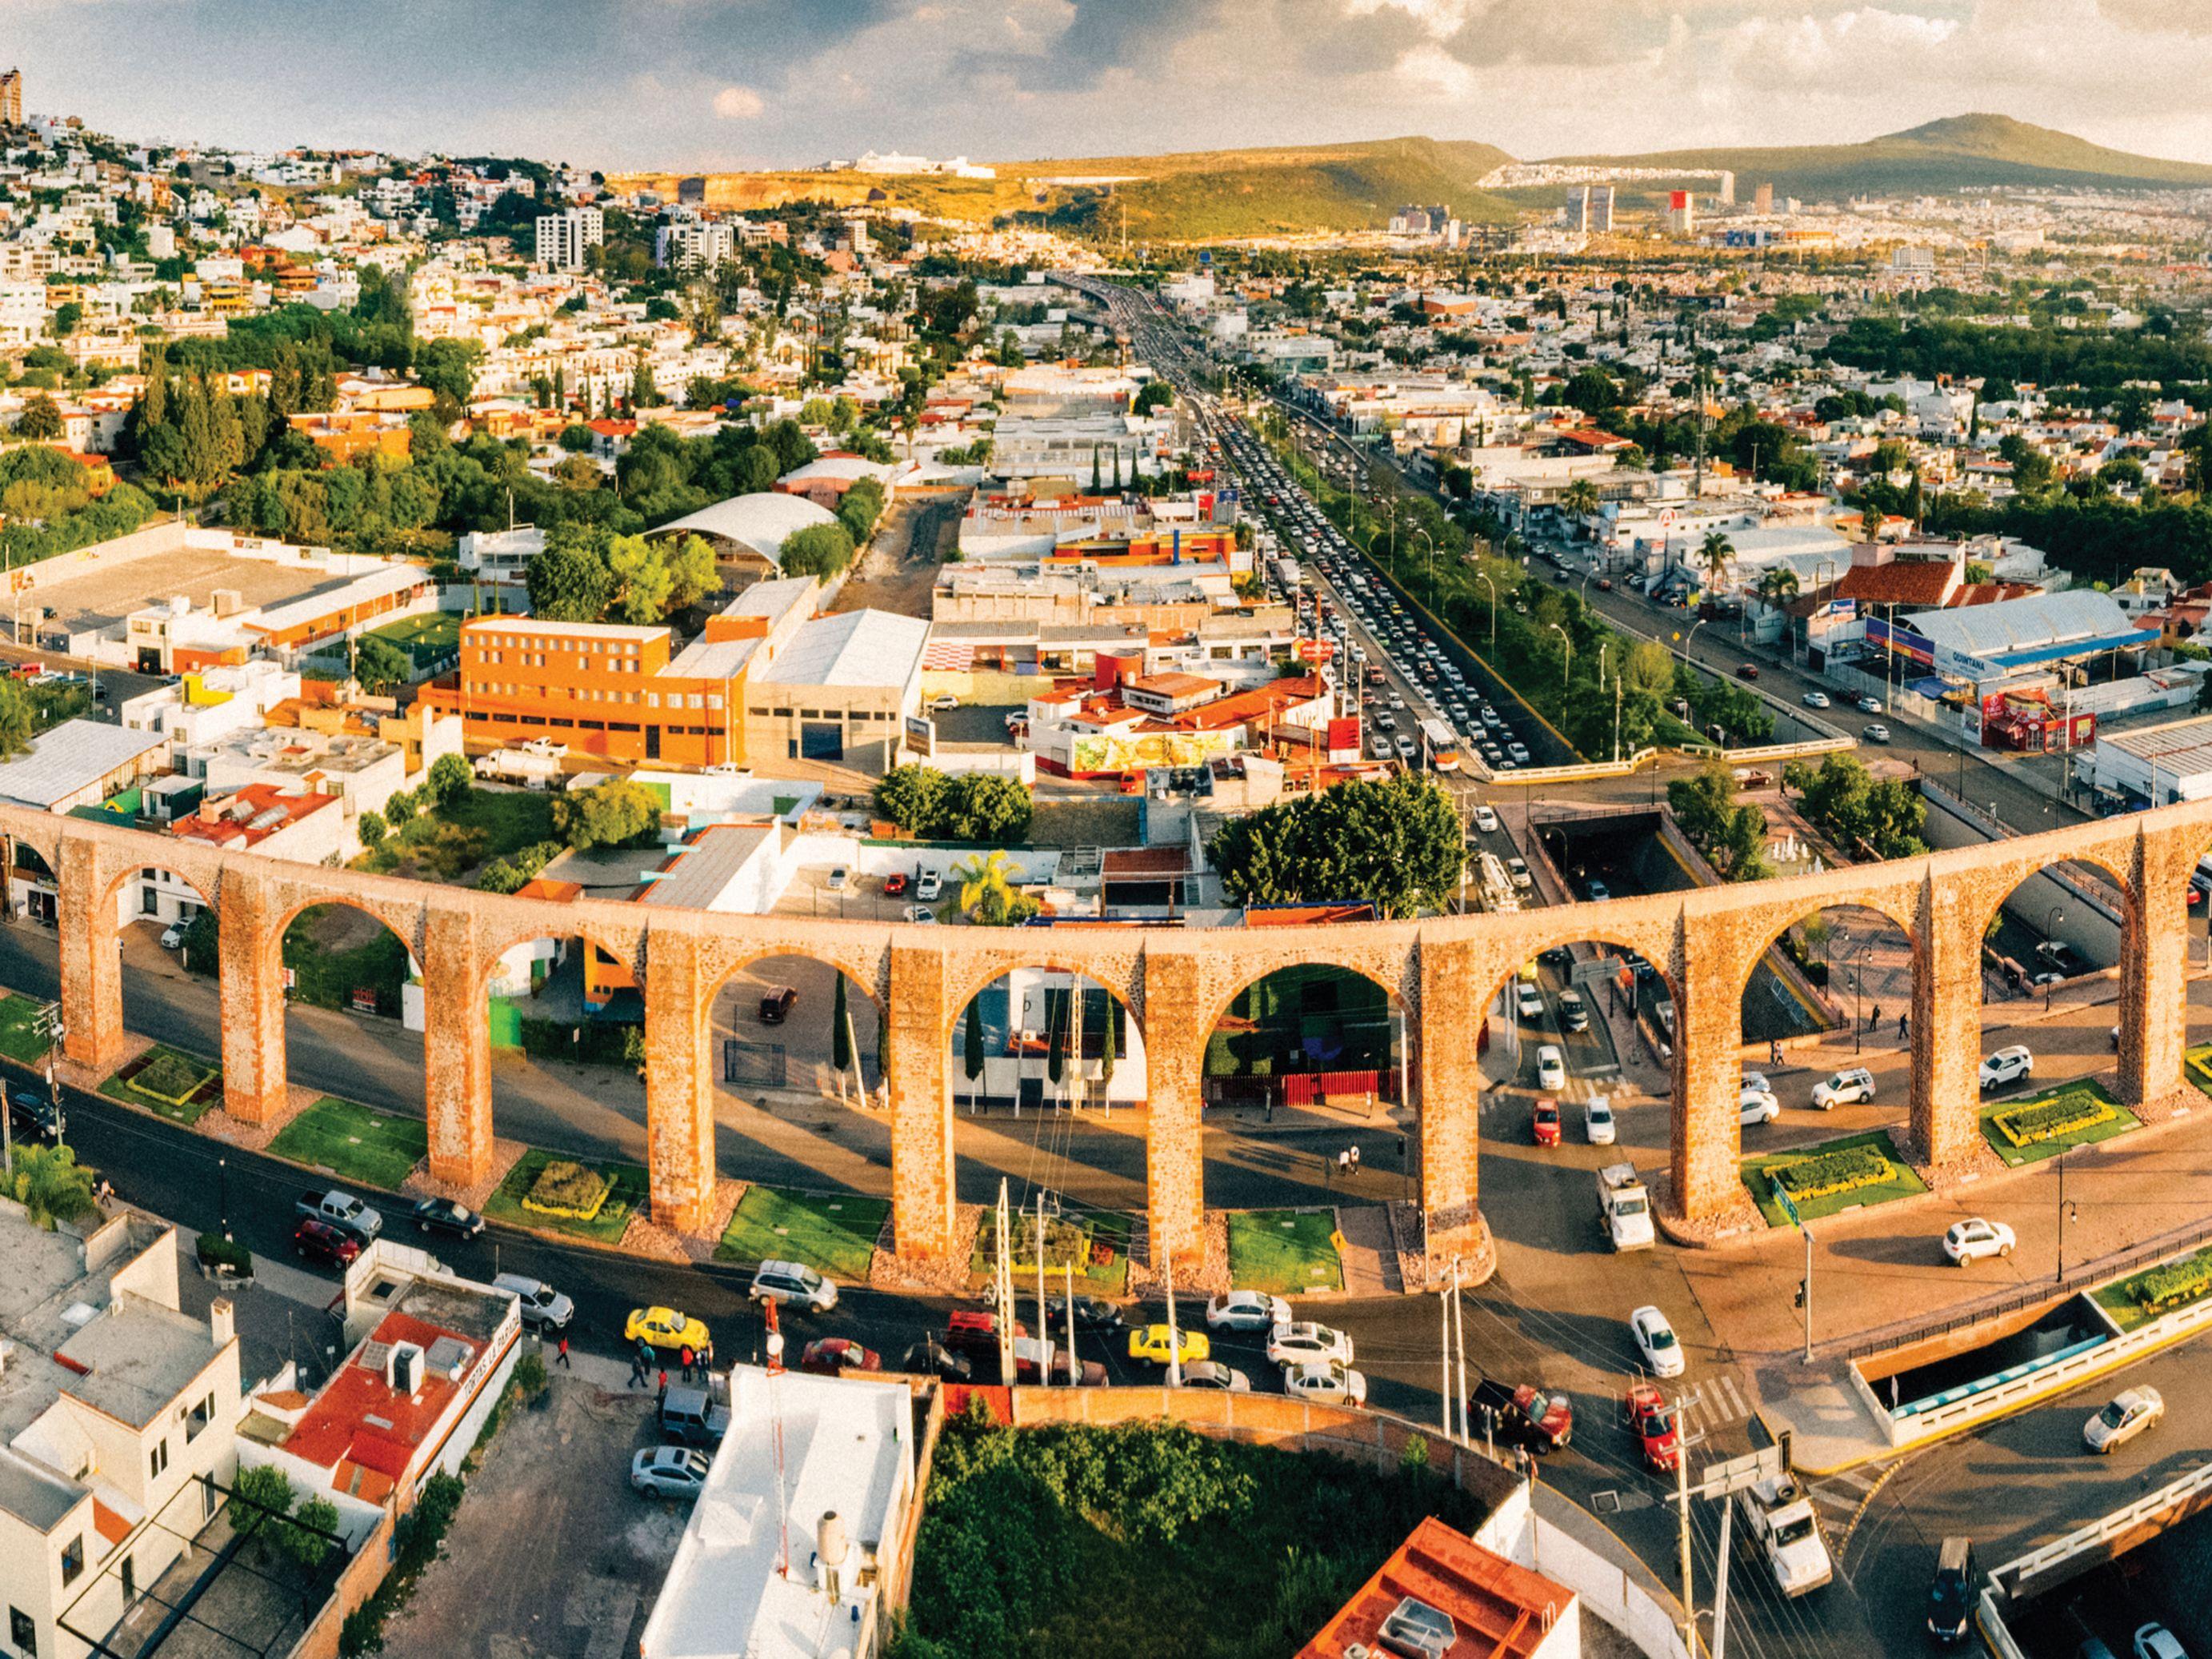 1216 mexico feature queretaro aqueduct vpm6rp